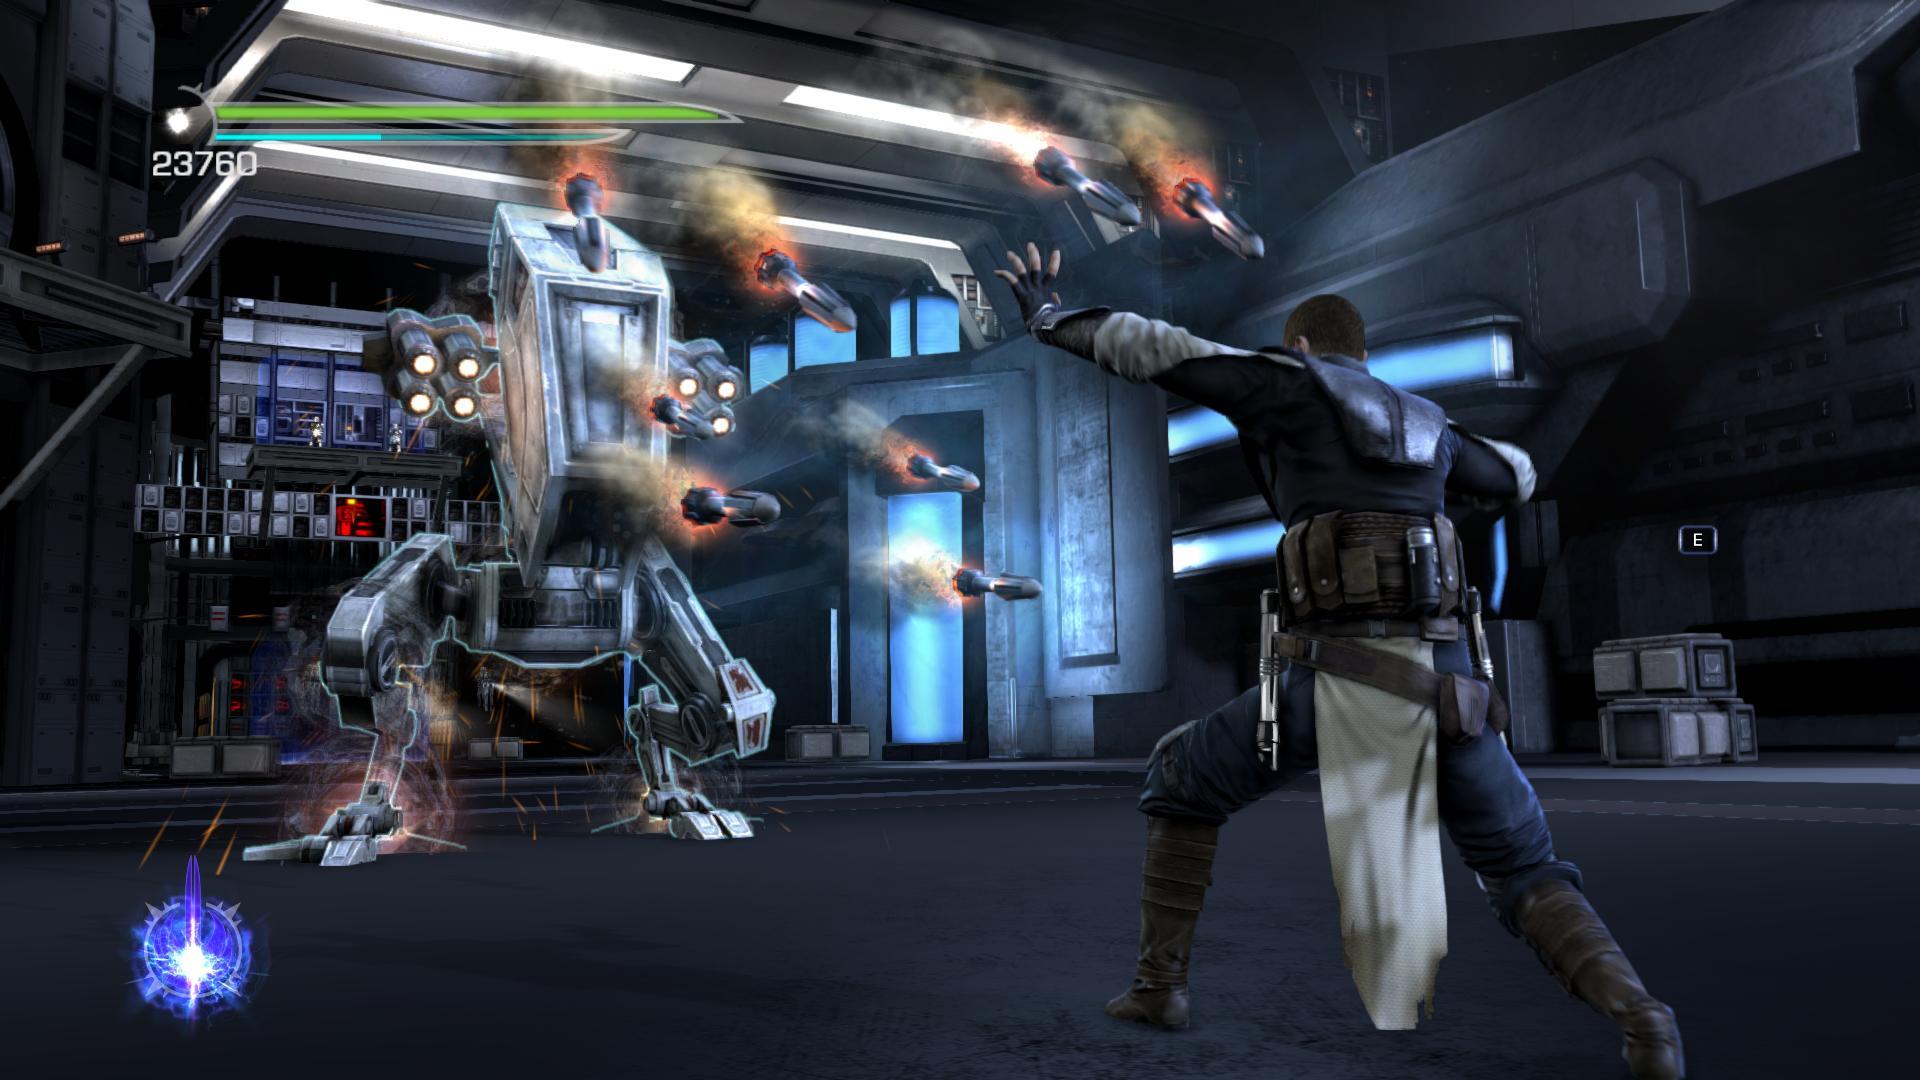 star wars games - HD1349×1080